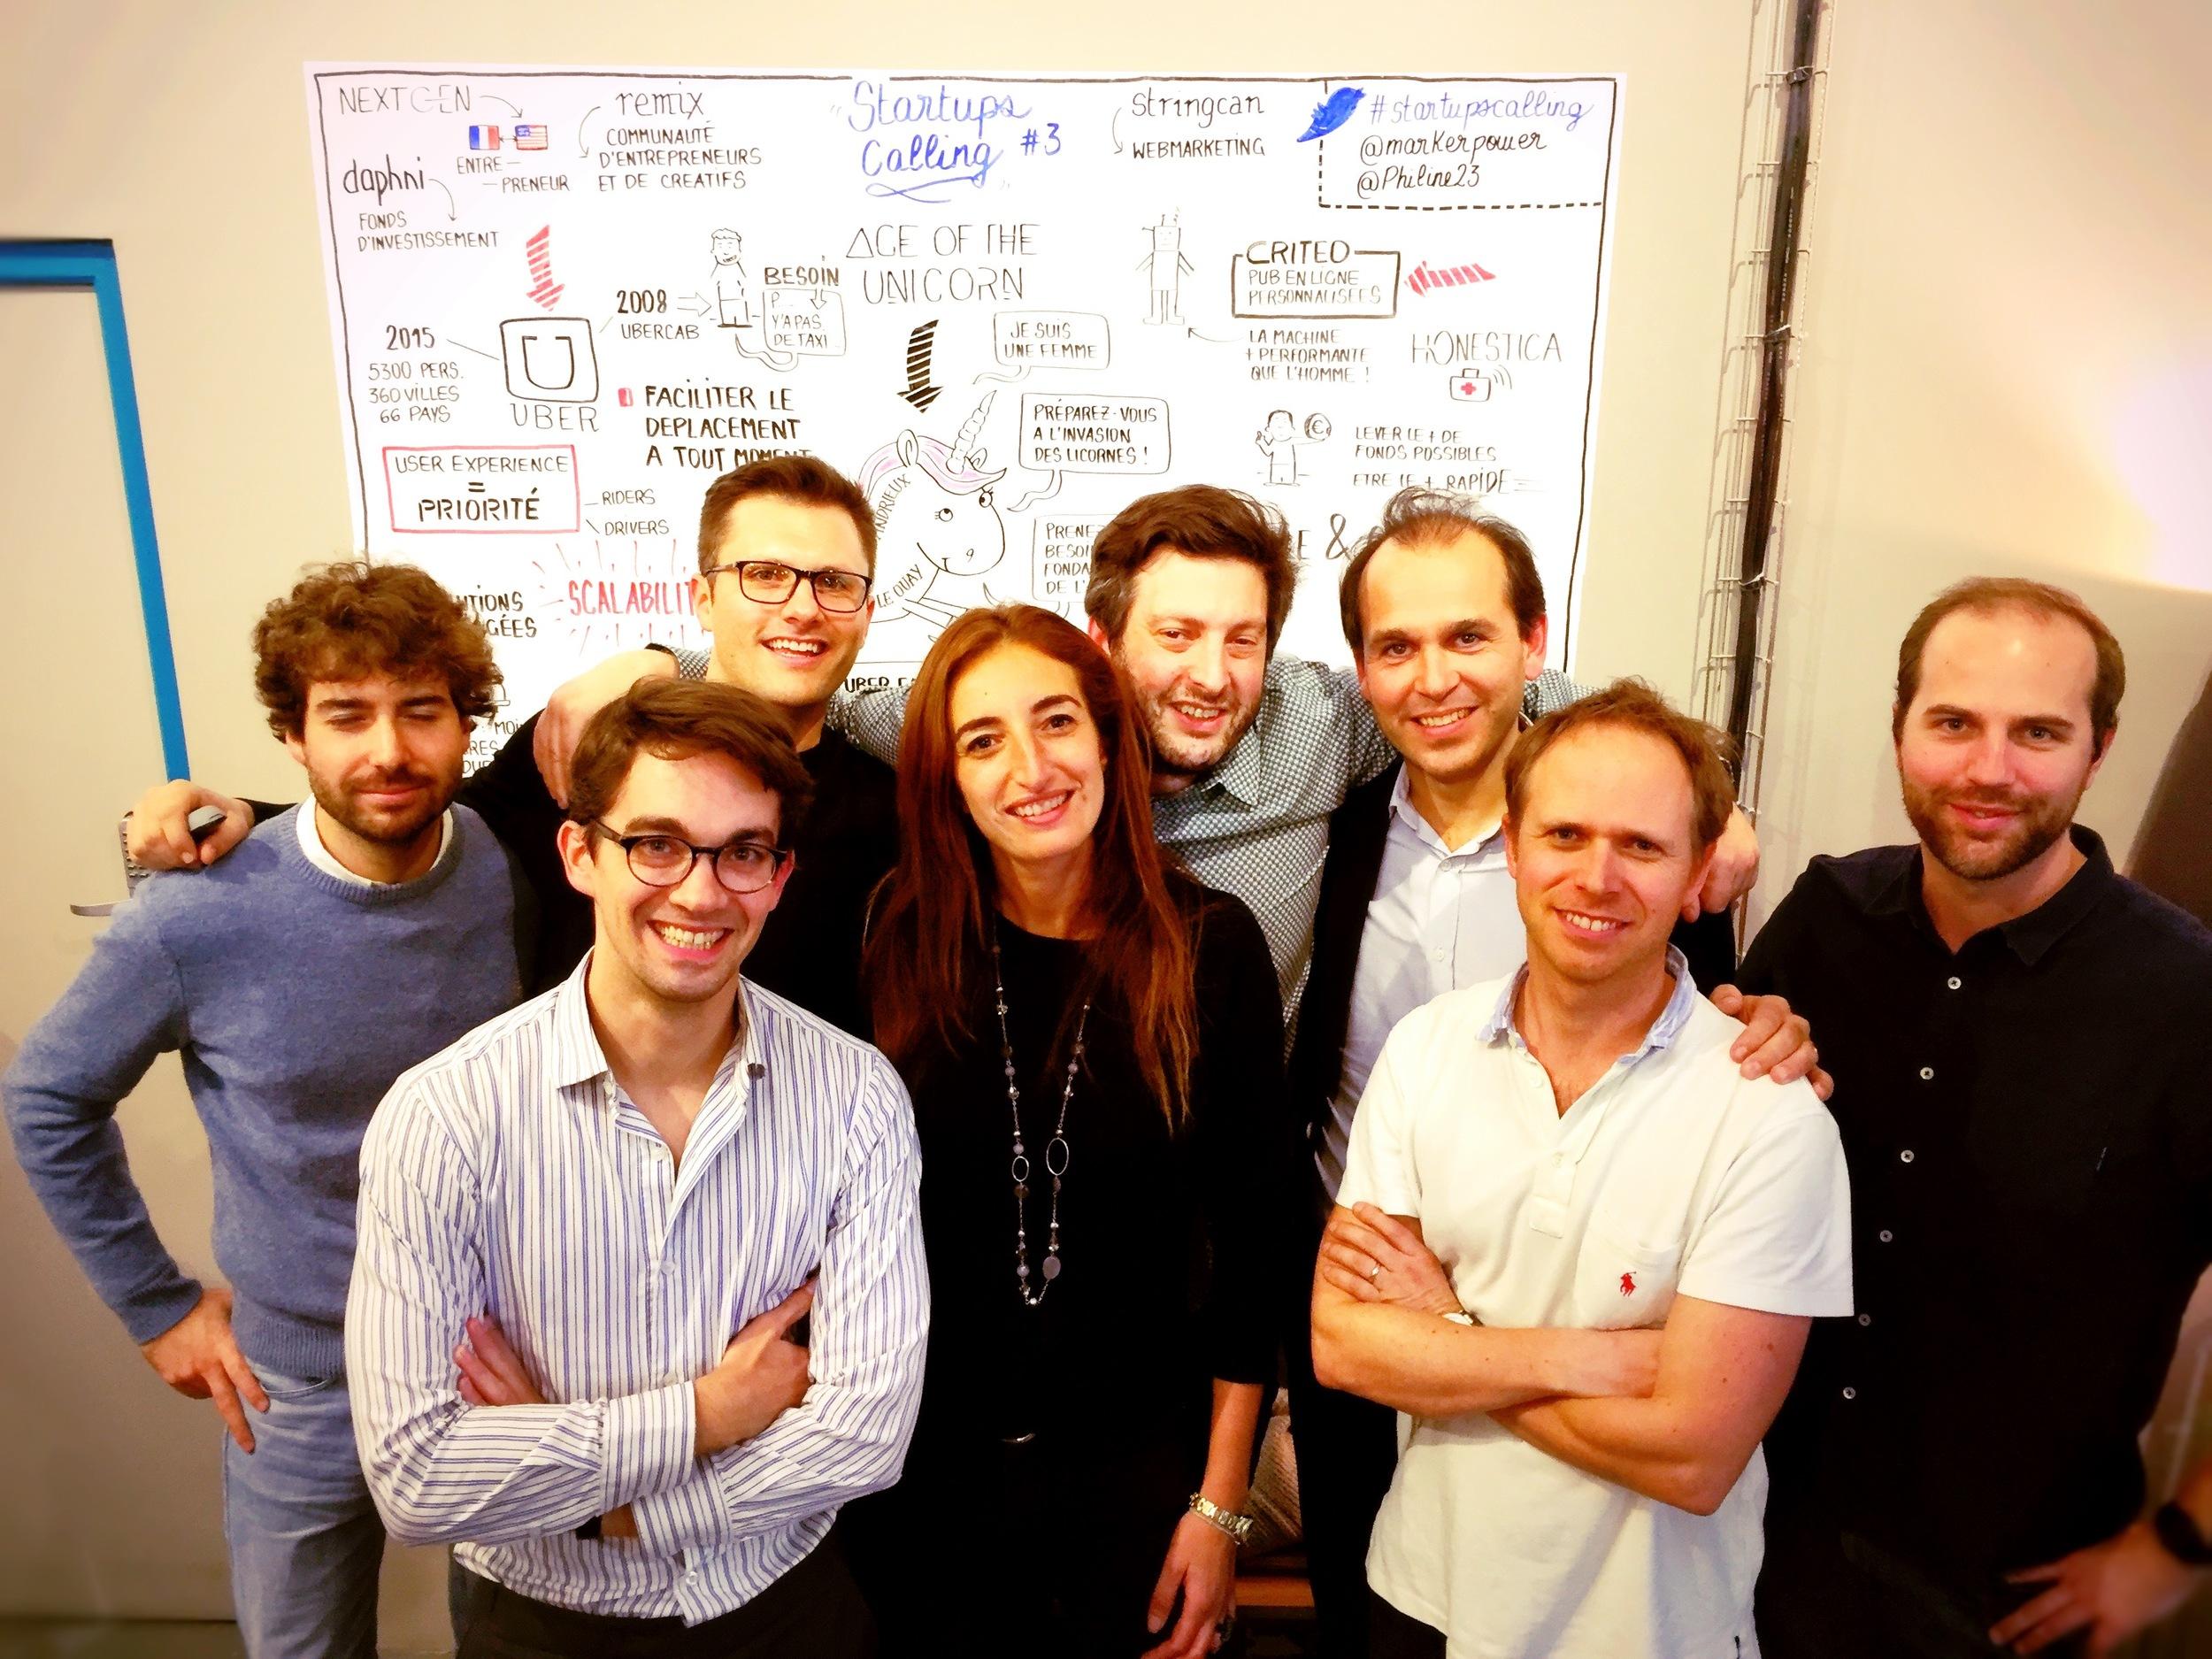 startups-calling-stringcan-interactive-remix-coworking-paris-9.jpg